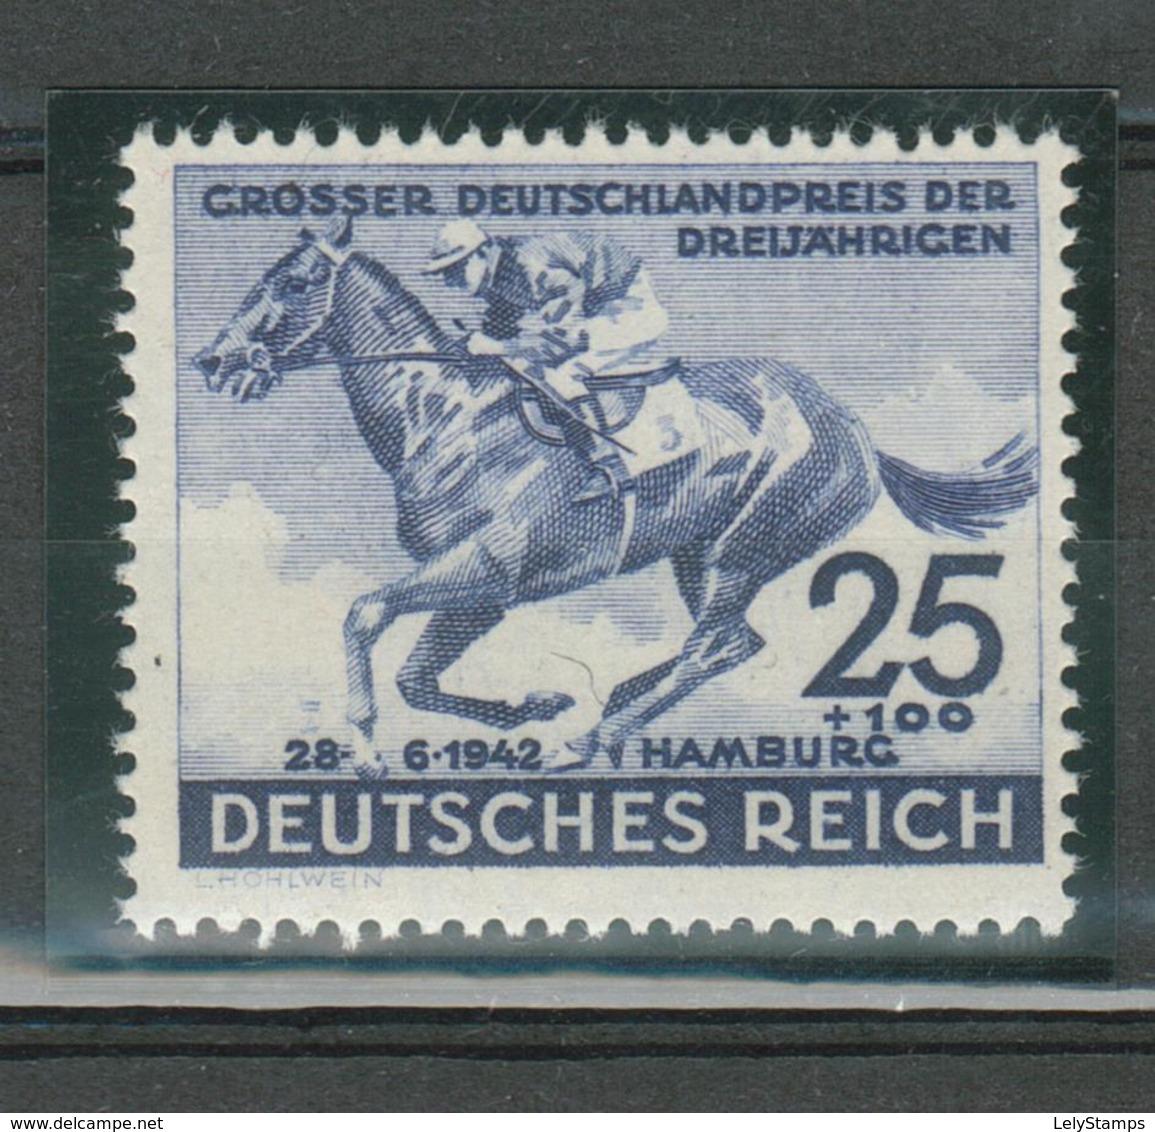 Duitse Rijk / Deutsches Reich DR 814 Postfrisch ** MNH - Duitsland